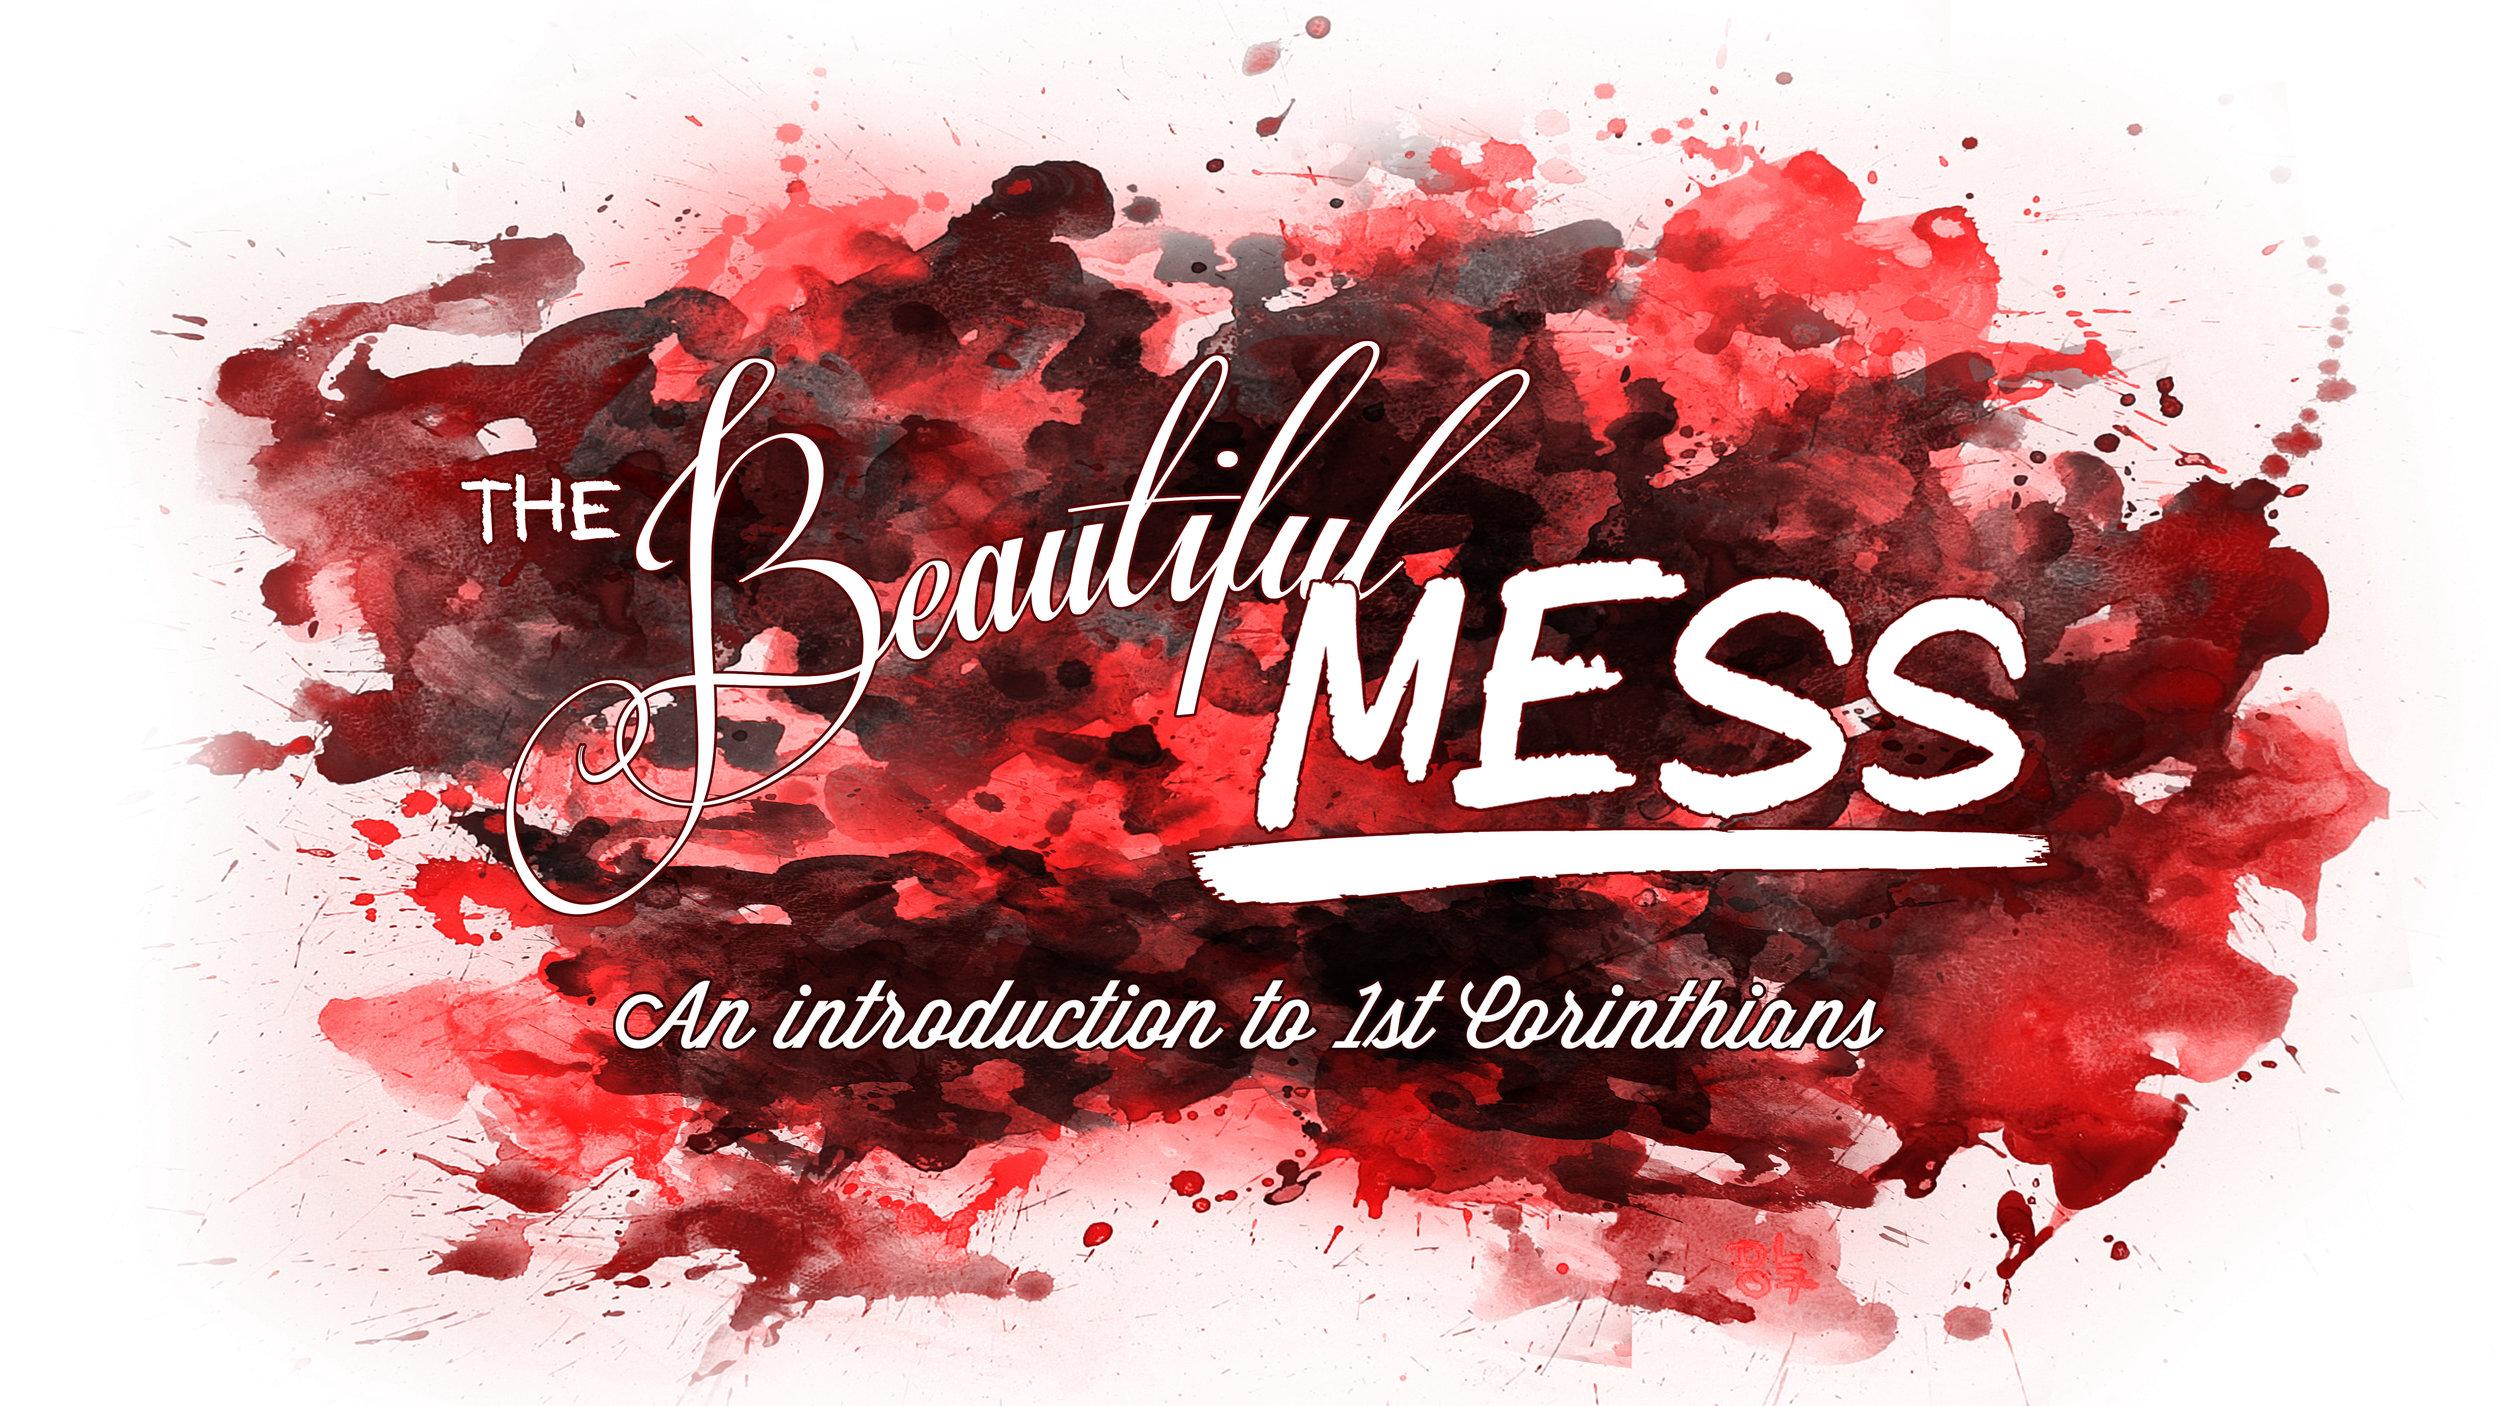 The-Beautiful-Mess-(SLIDE).jpg